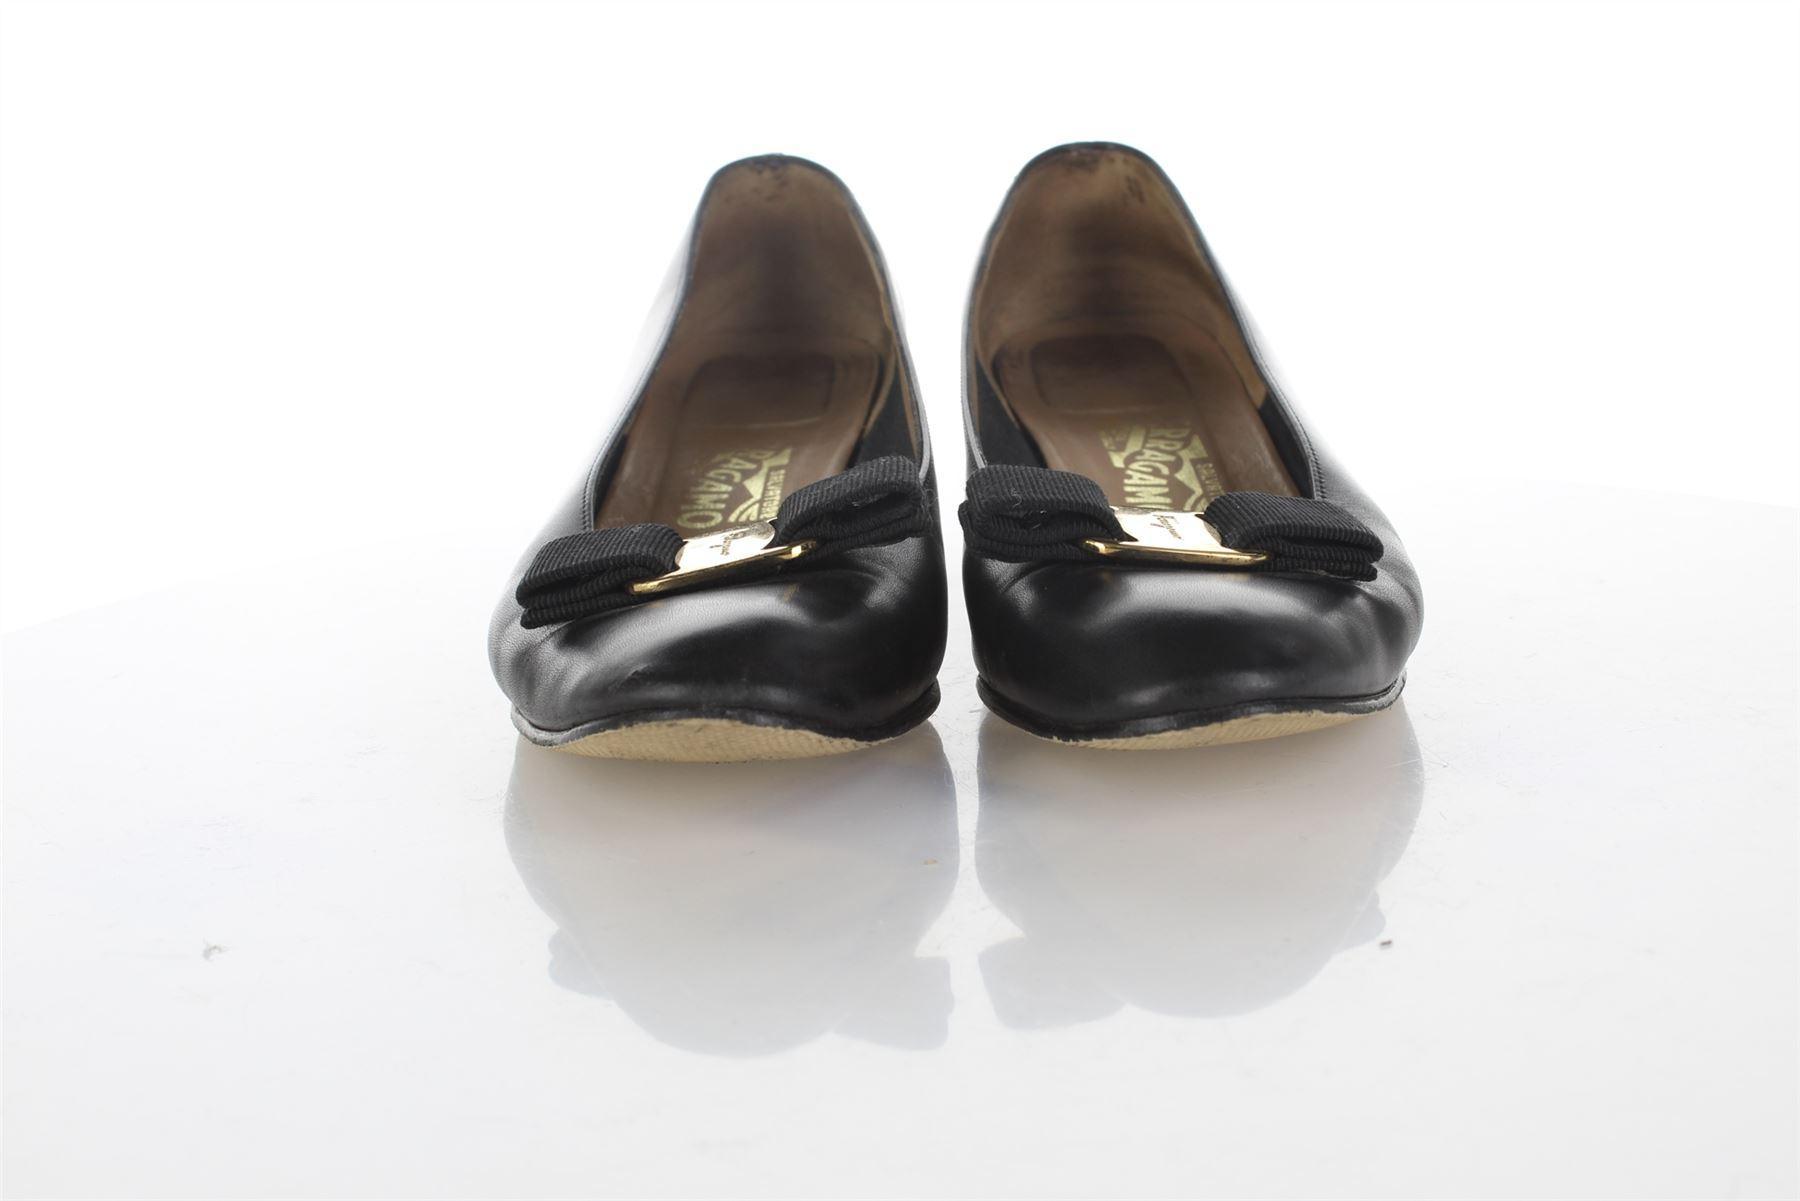 SALVATORE FERRAGAMO Vara Bow Scarpe in pelle nera UK 4.5 US 7.5 EU 37.5